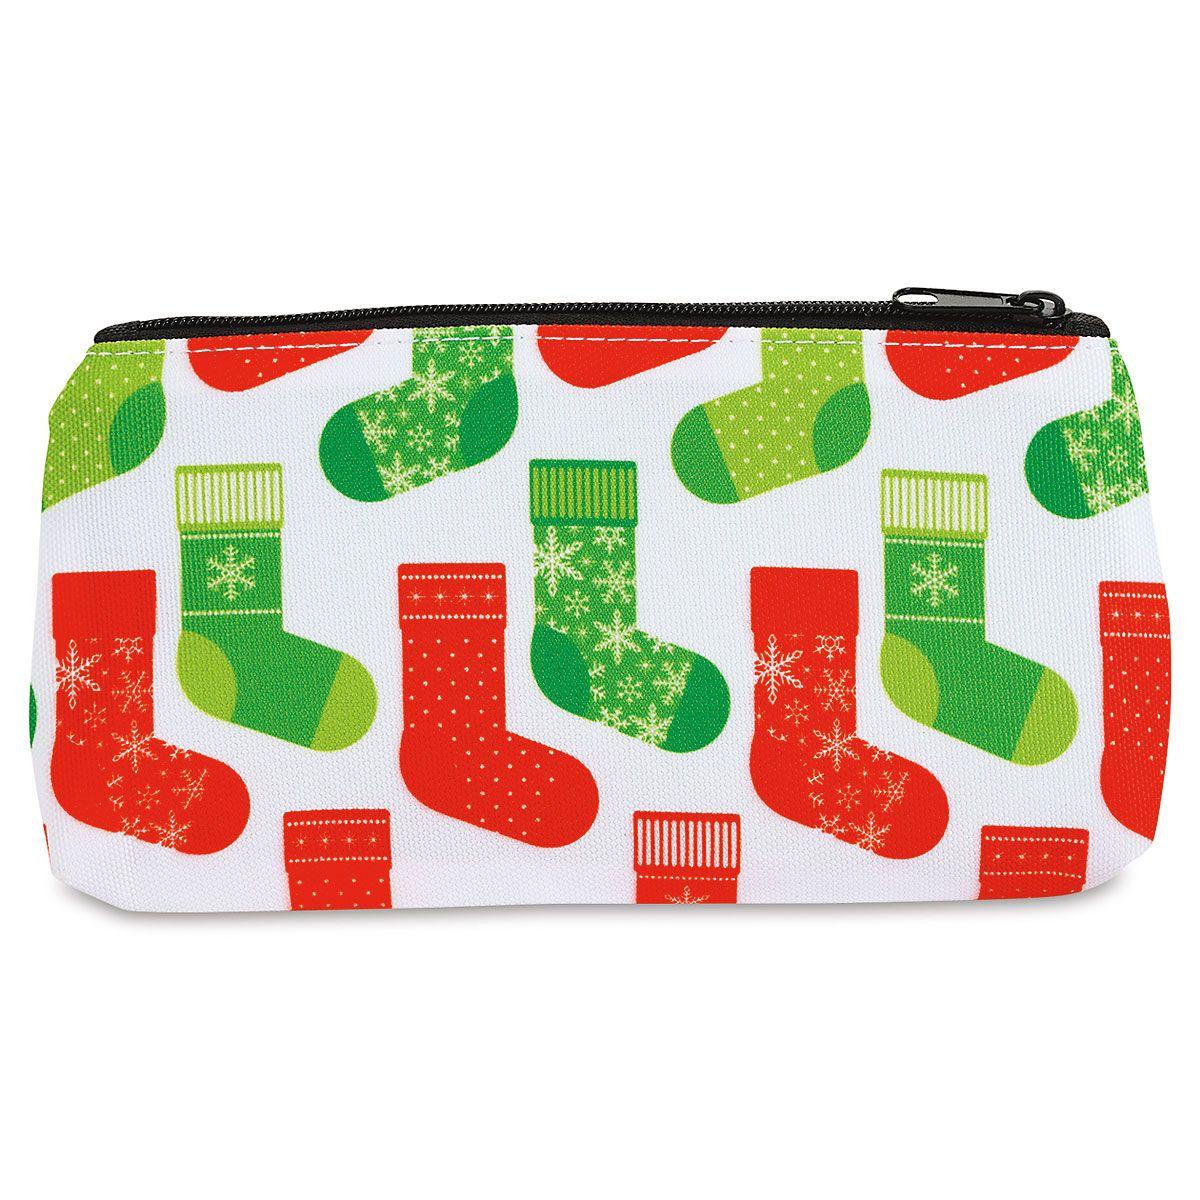 Red & Green Zipper Pouches - BOGO